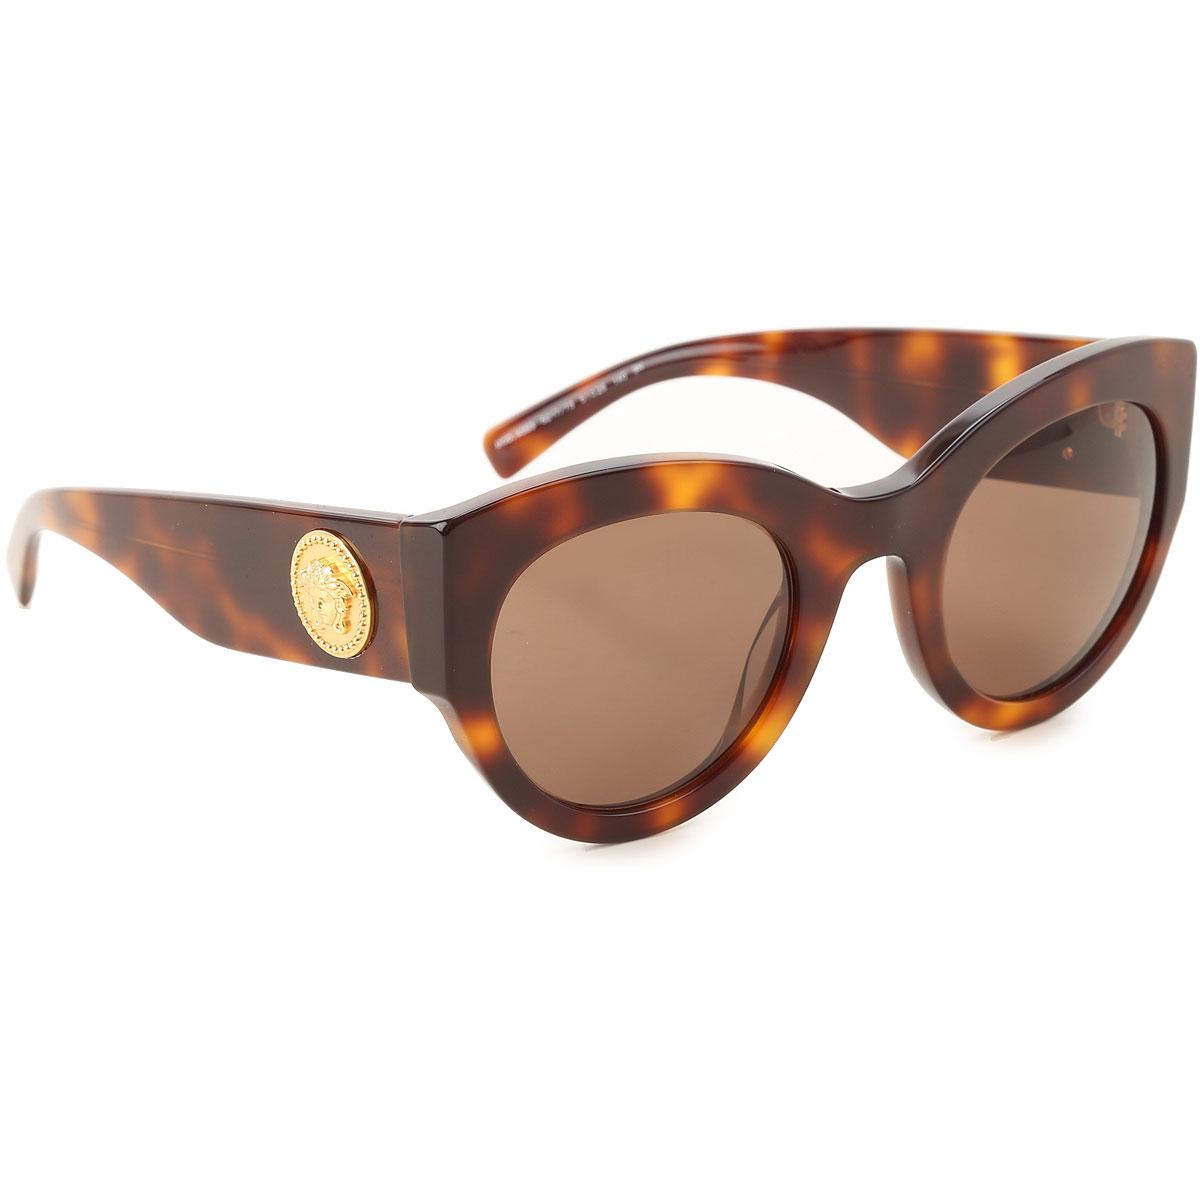 Gianni Versace Sunglasses On Sale, Havana, 2019